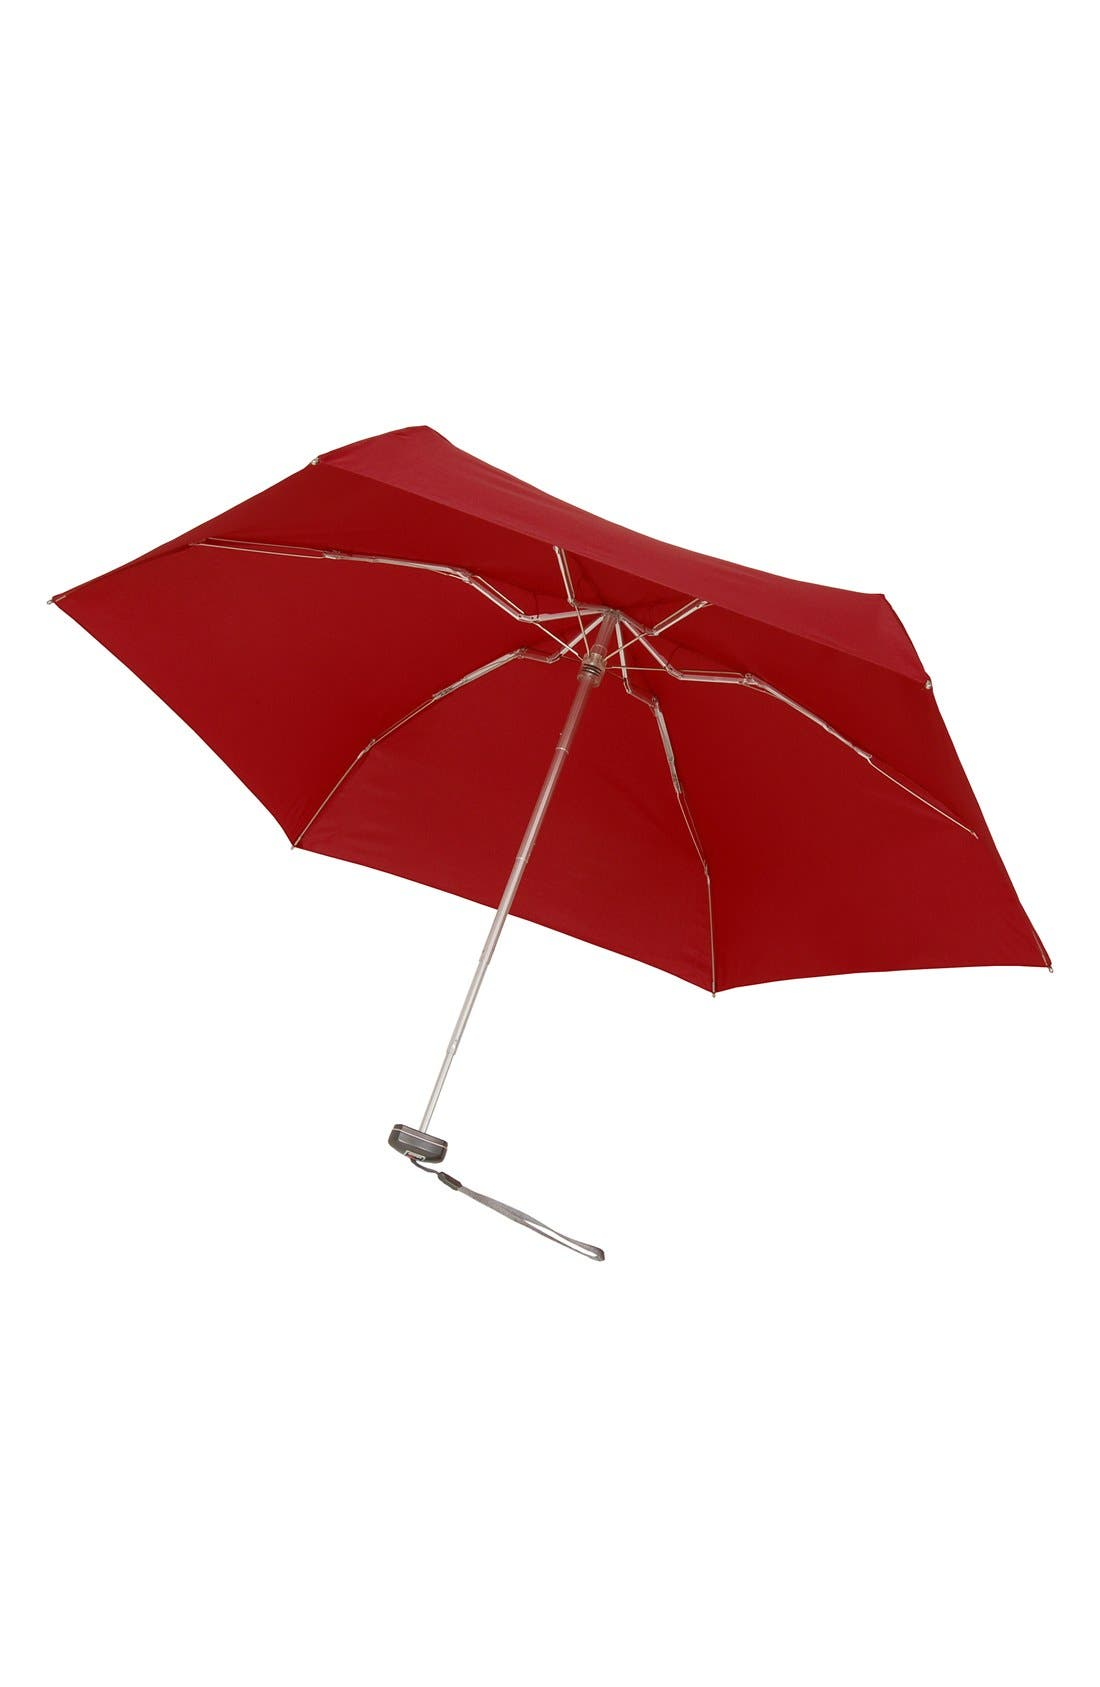 Alternate Image 1 Selected - Knirps Travel Umbrella